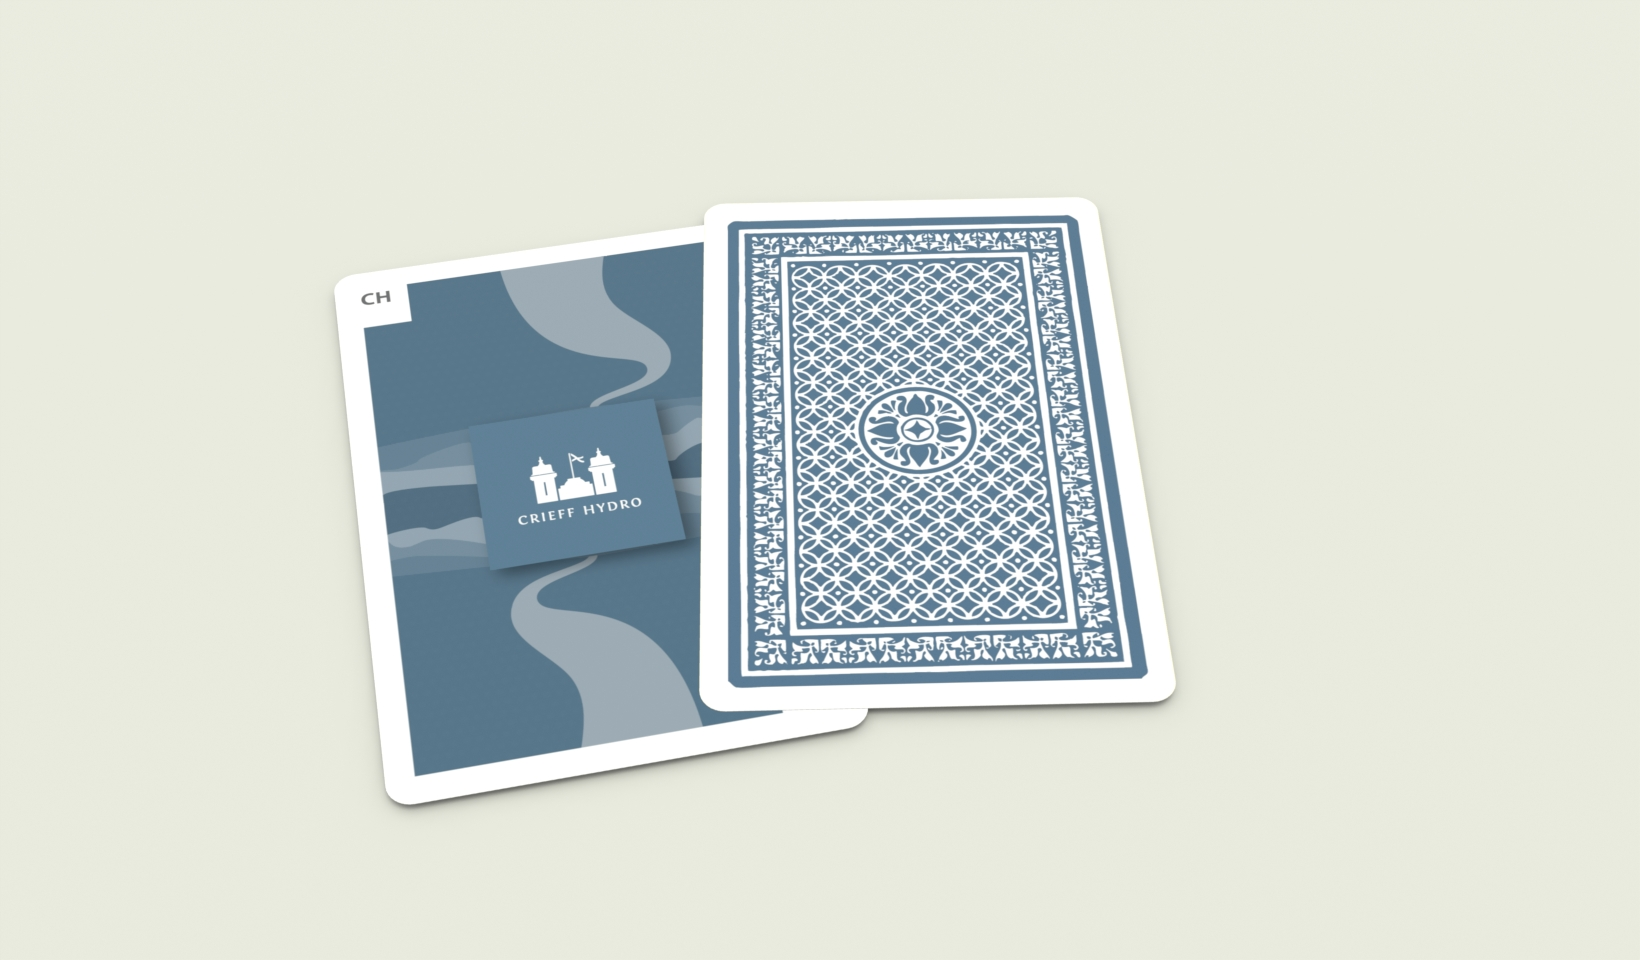 Cards_1JPG.JPG